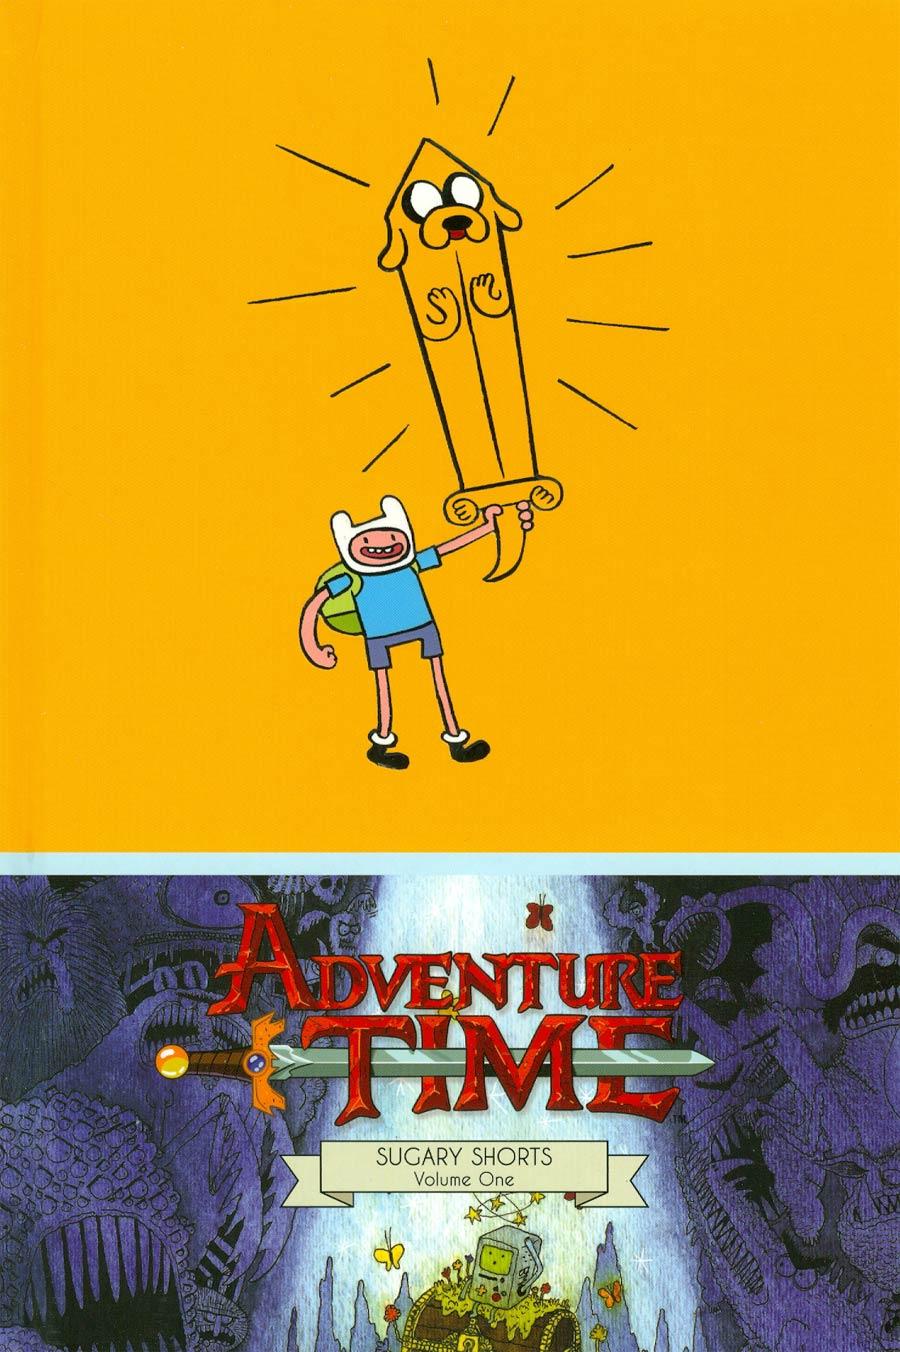 Adventure Time Sugary Shorts Vol 1 HC